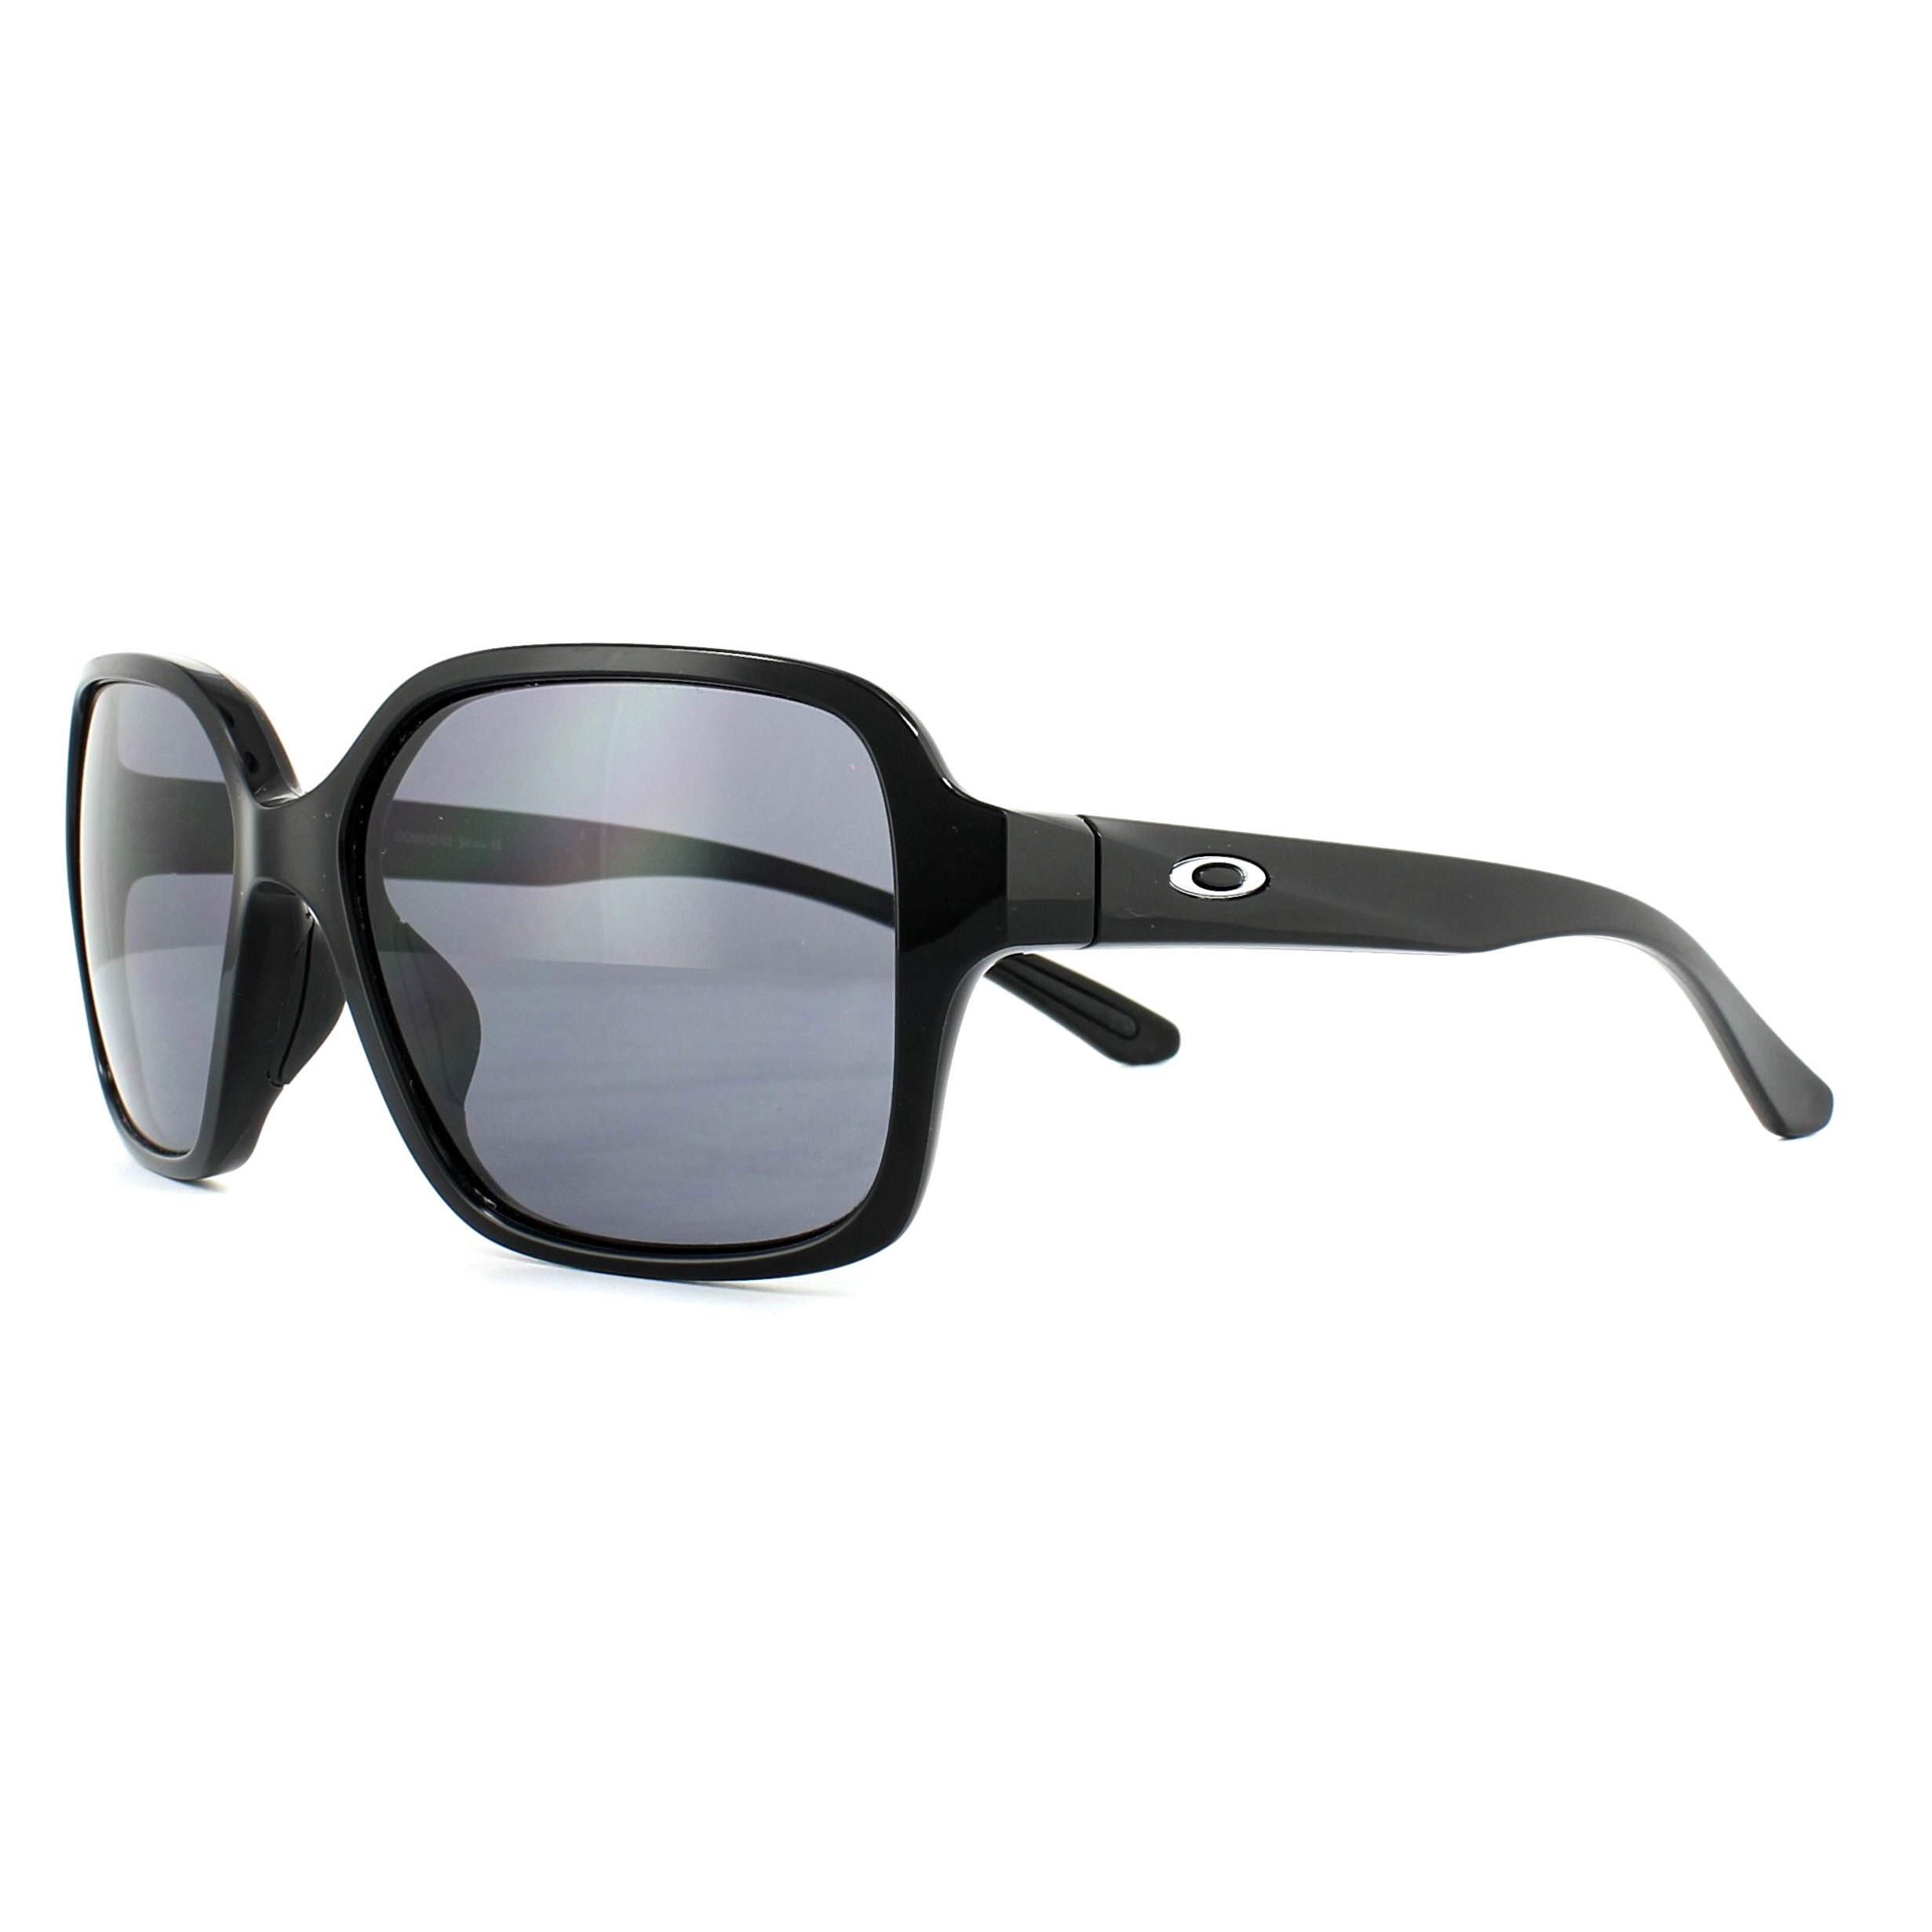 2082e02891 Oakley Dispatch 2 Polished Black Grey « One More Soul